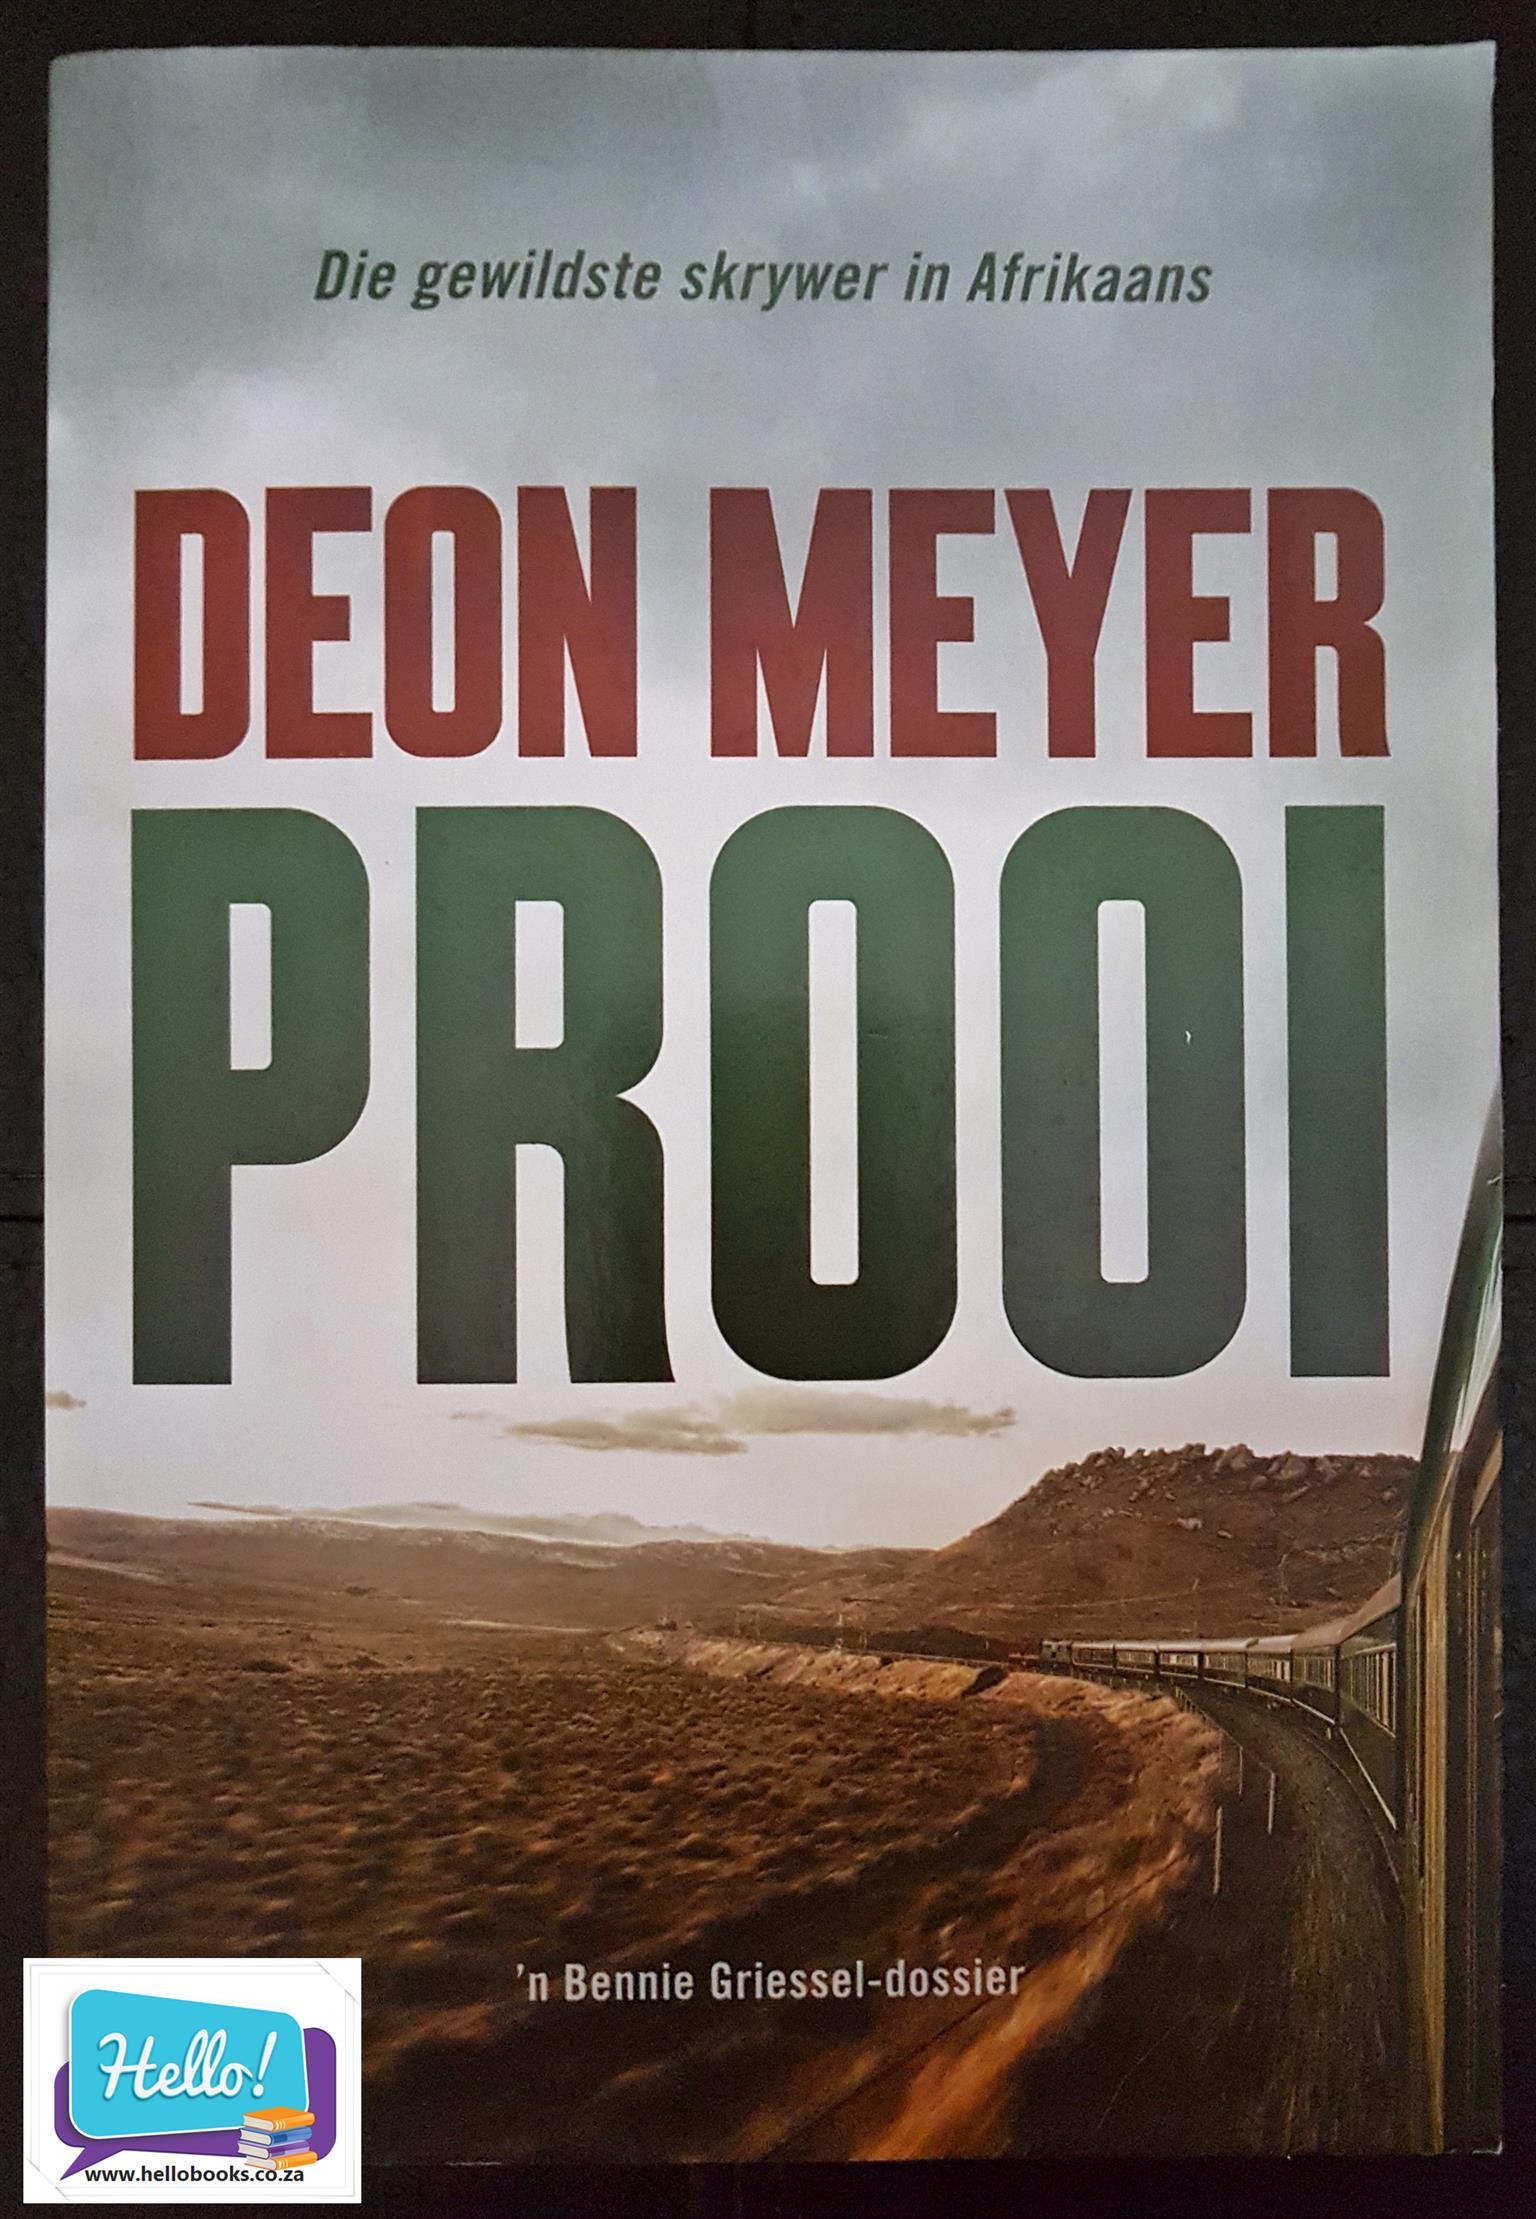 Deon Meyer Prooi